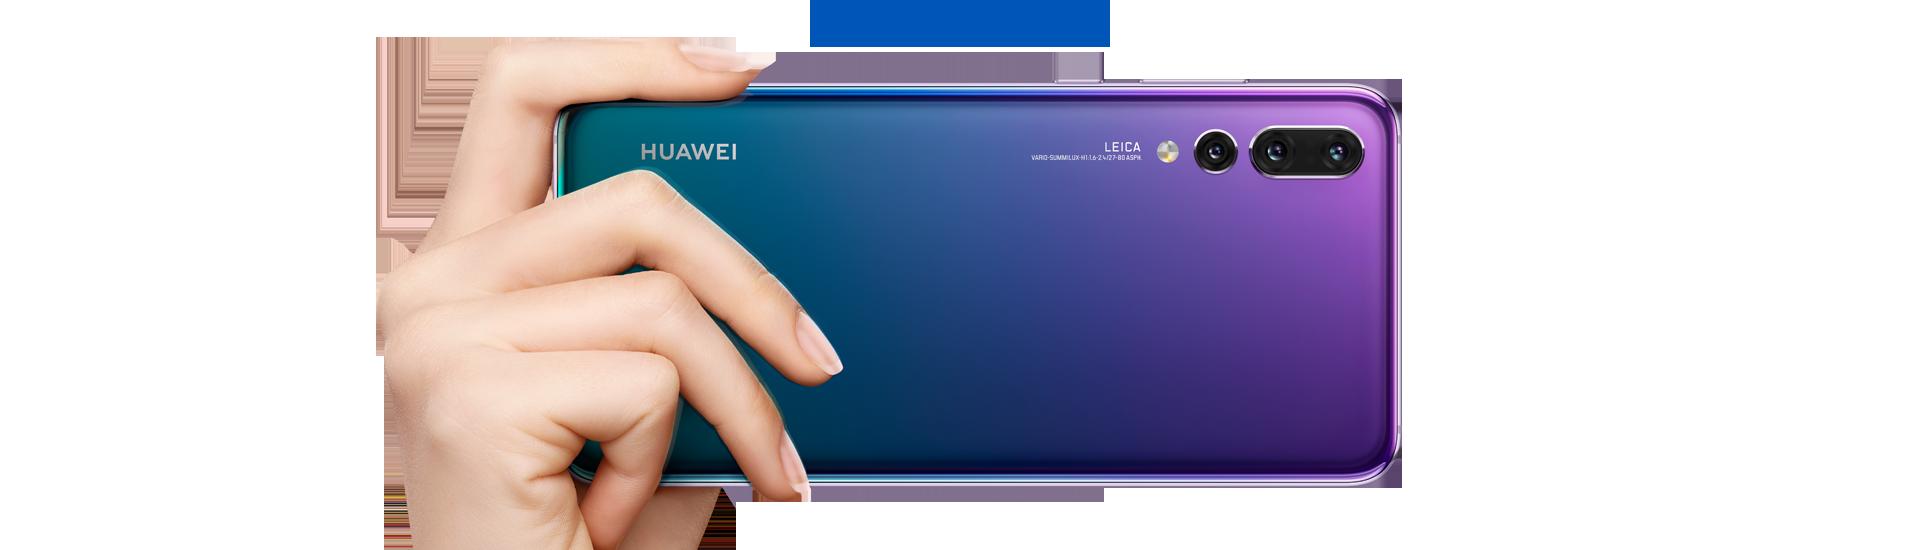 https://consumer-img.huawei.com/content/dam/huawei-cbg-campaign/2018/p20-pro/common/img/camera/dxo-model-p20-pro.png